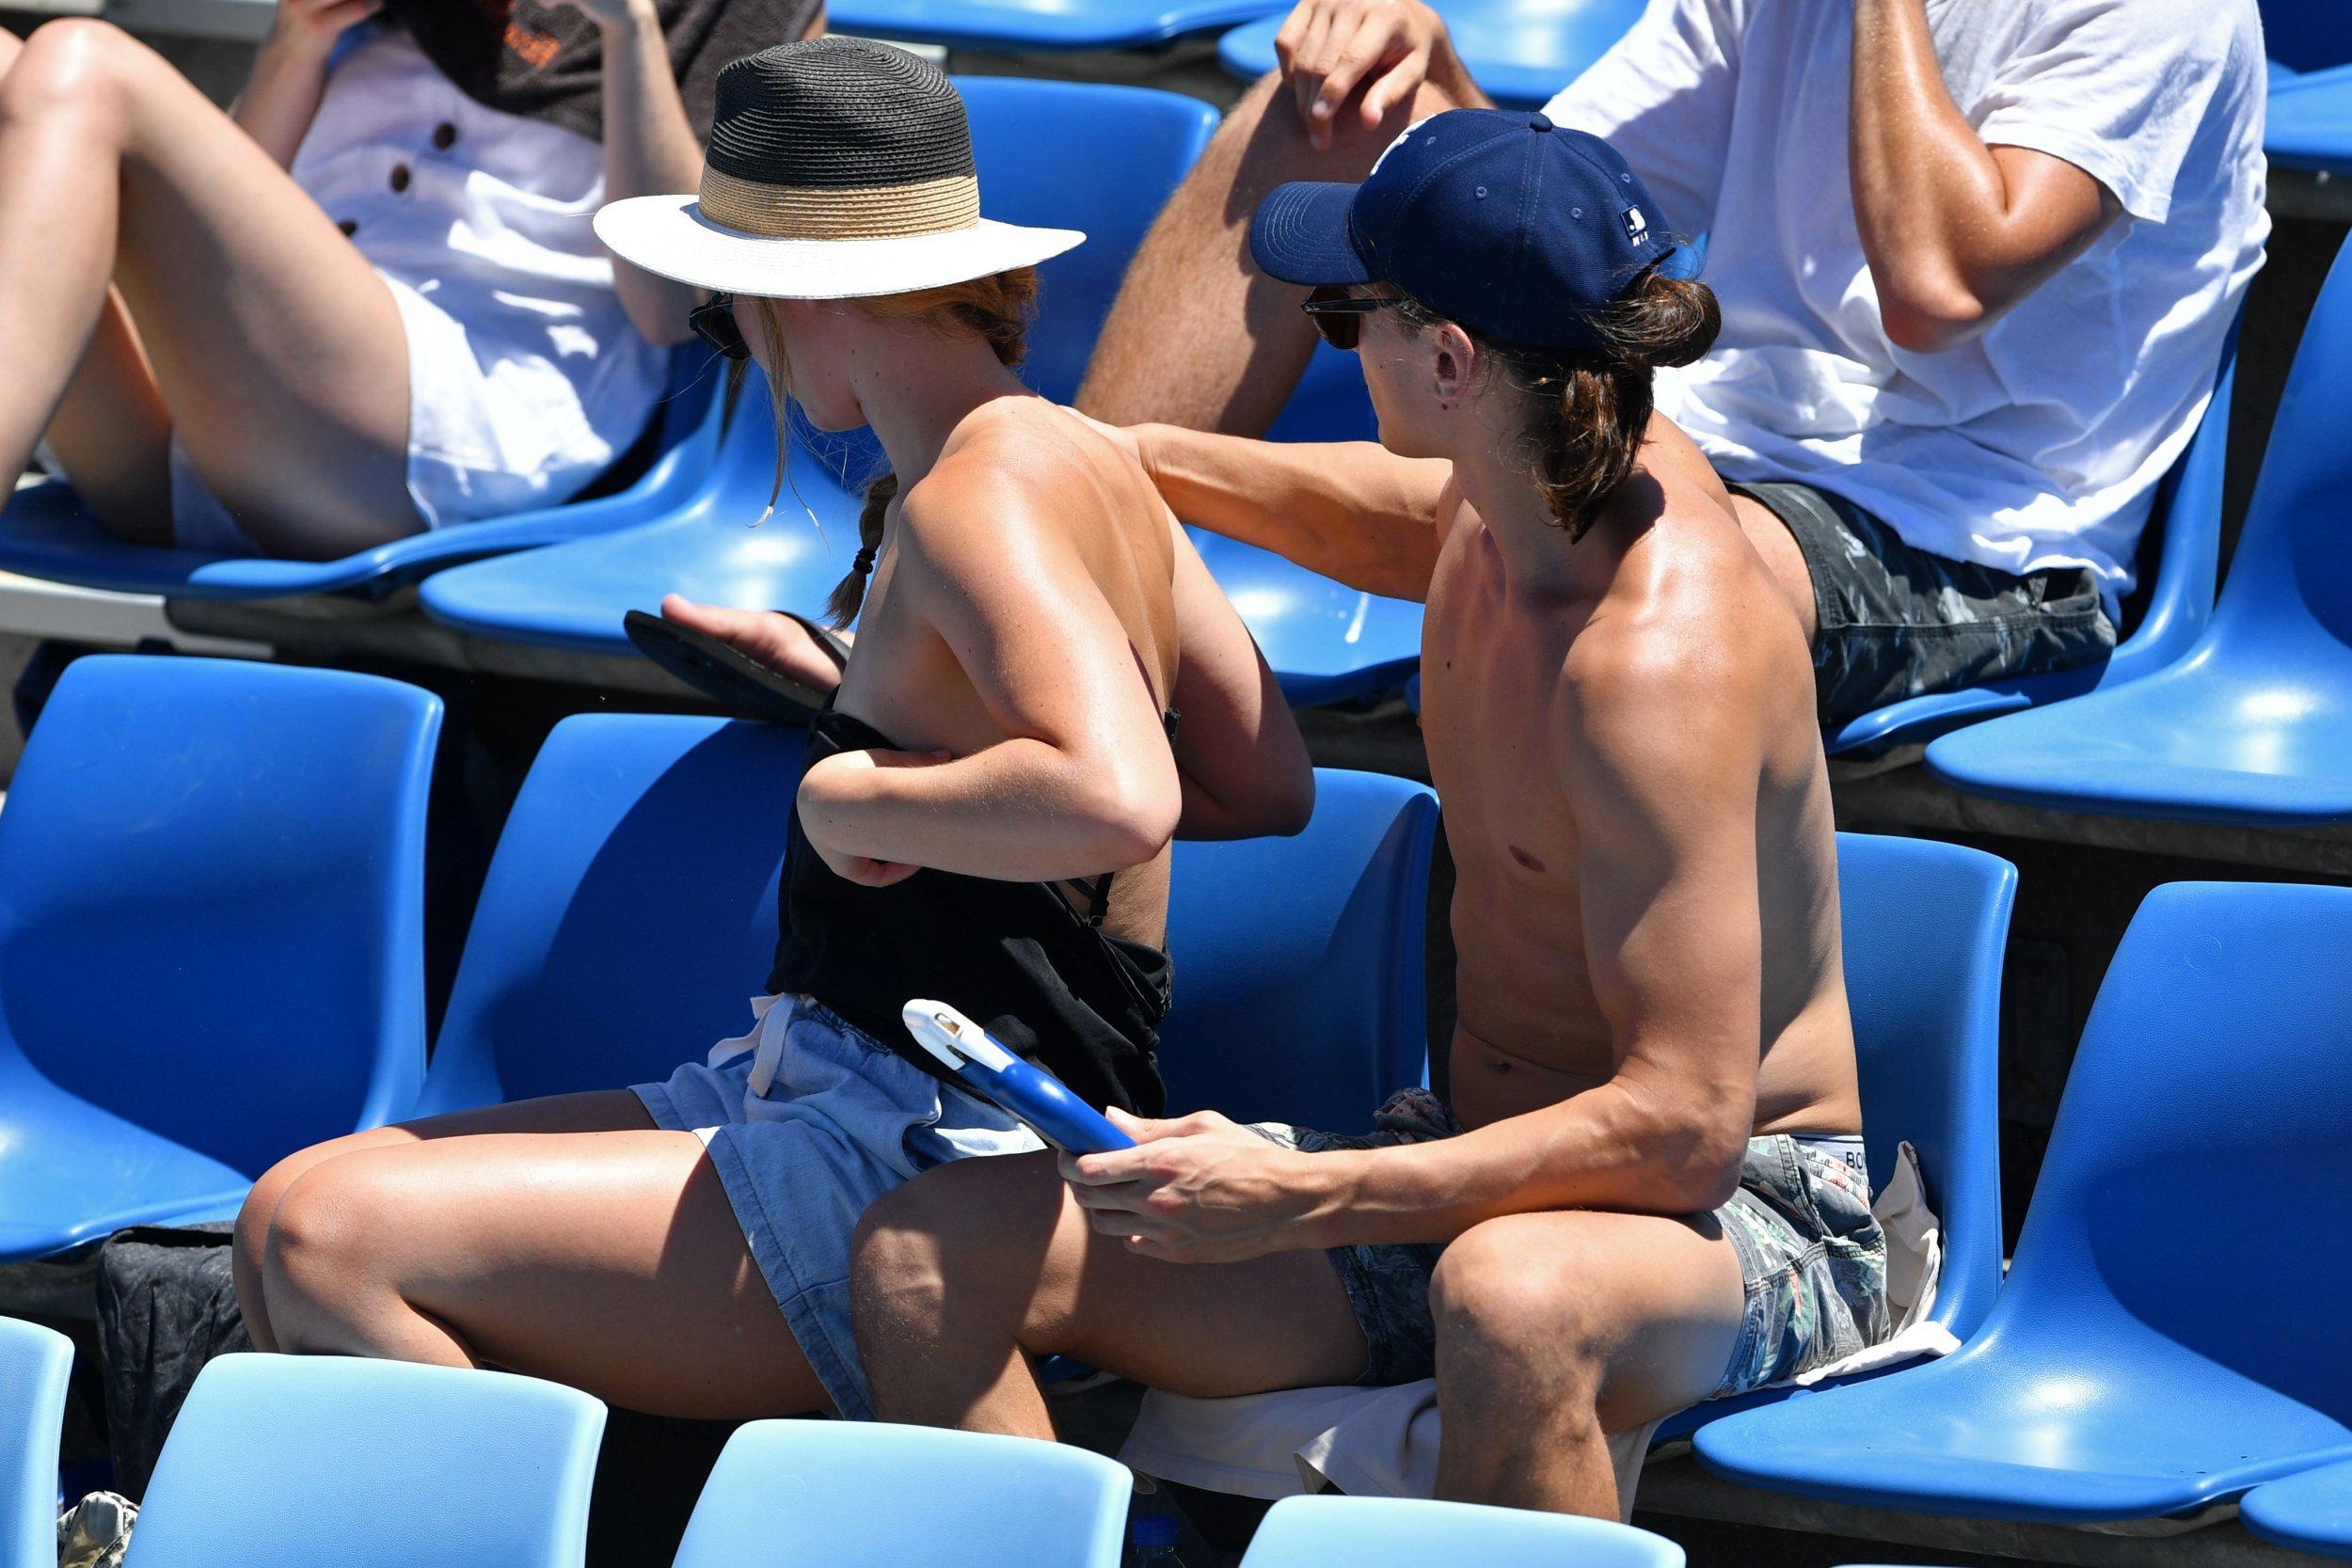 sunscreen lotion application